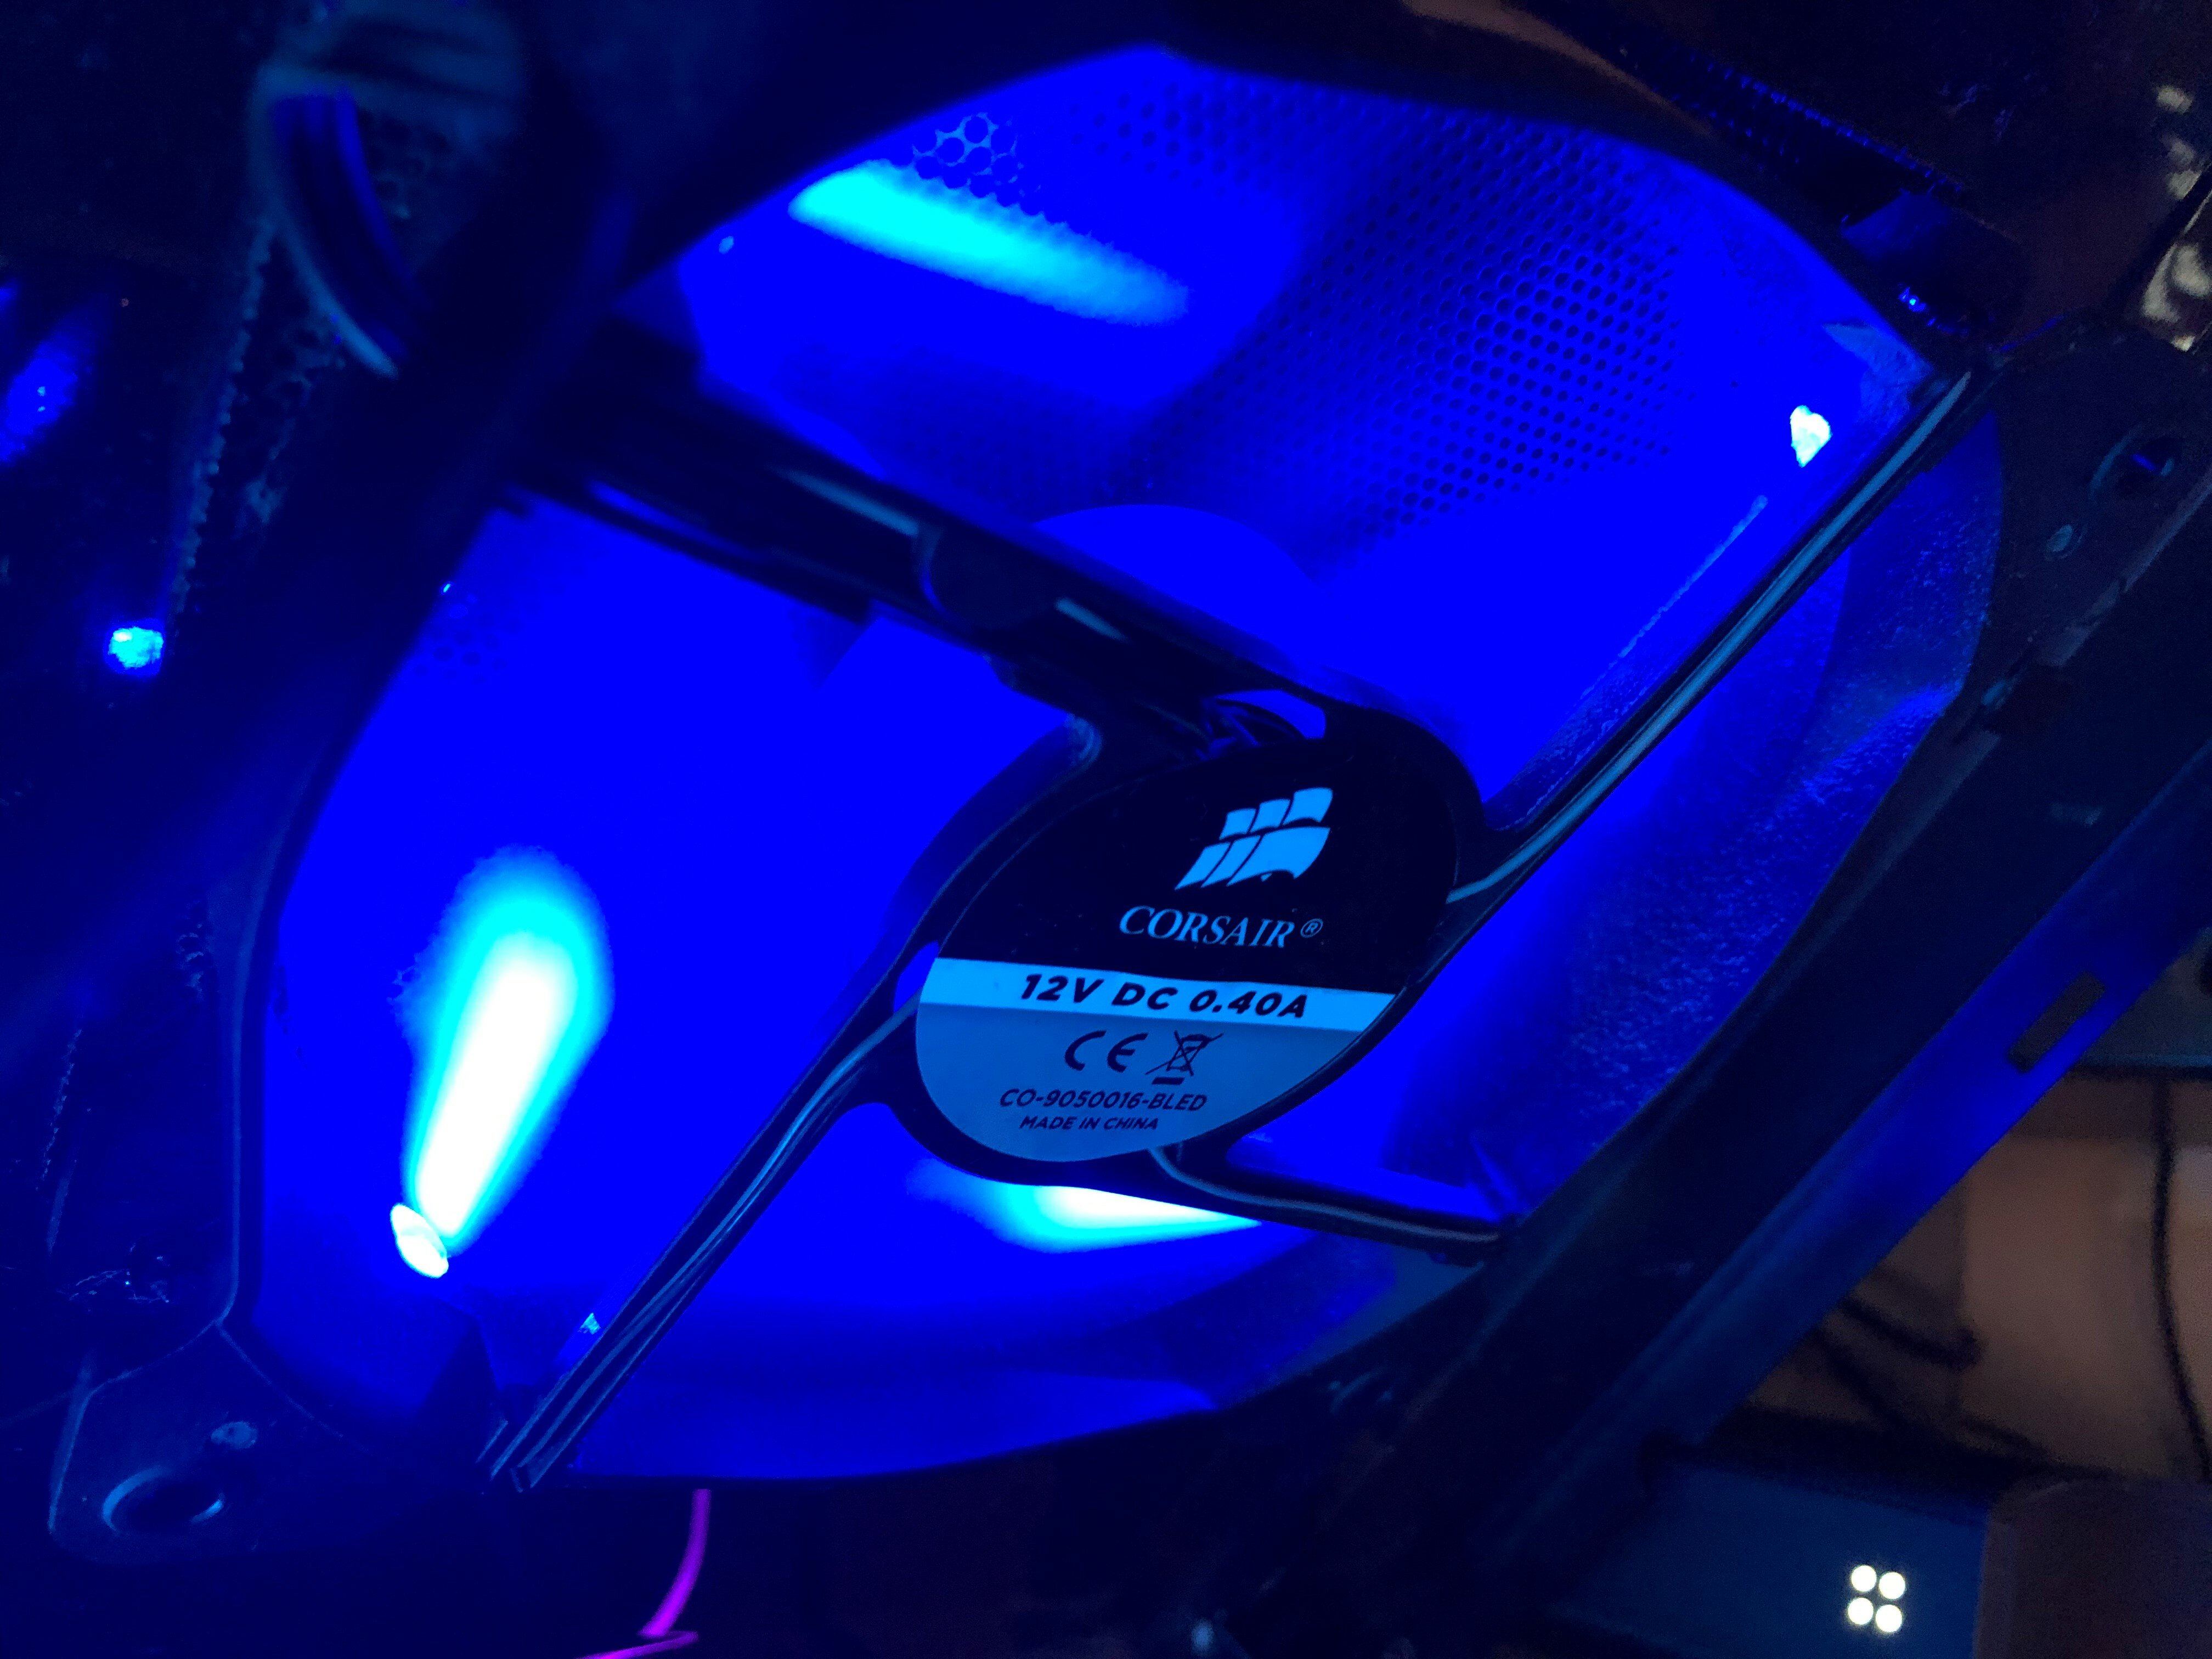 GTX580 Sudden Overheating Issue | AVForums